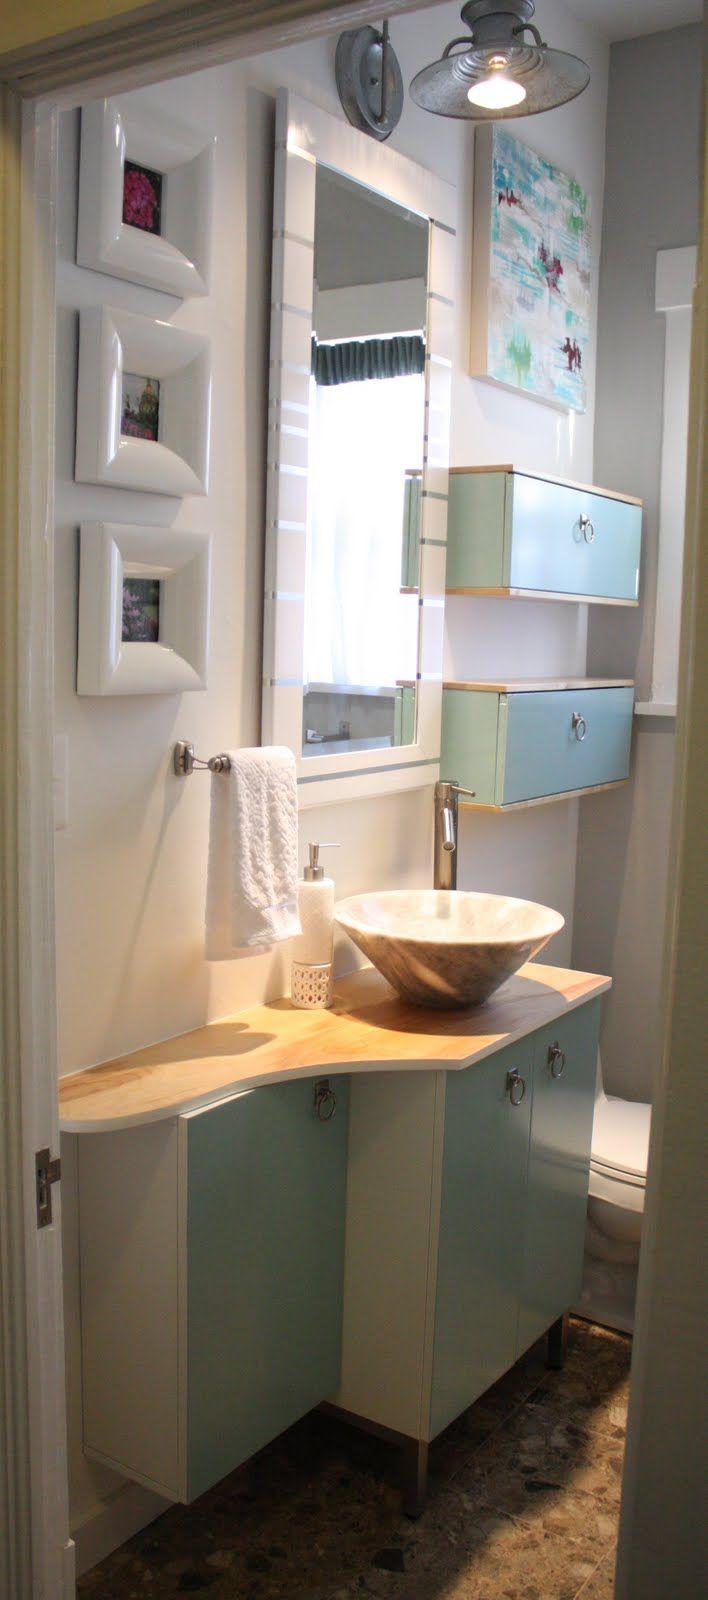 Ikea lillangen bathroom mirror cabinet - Lillangen Bathroom Remodel Ikea Hackers Ikea Hackers